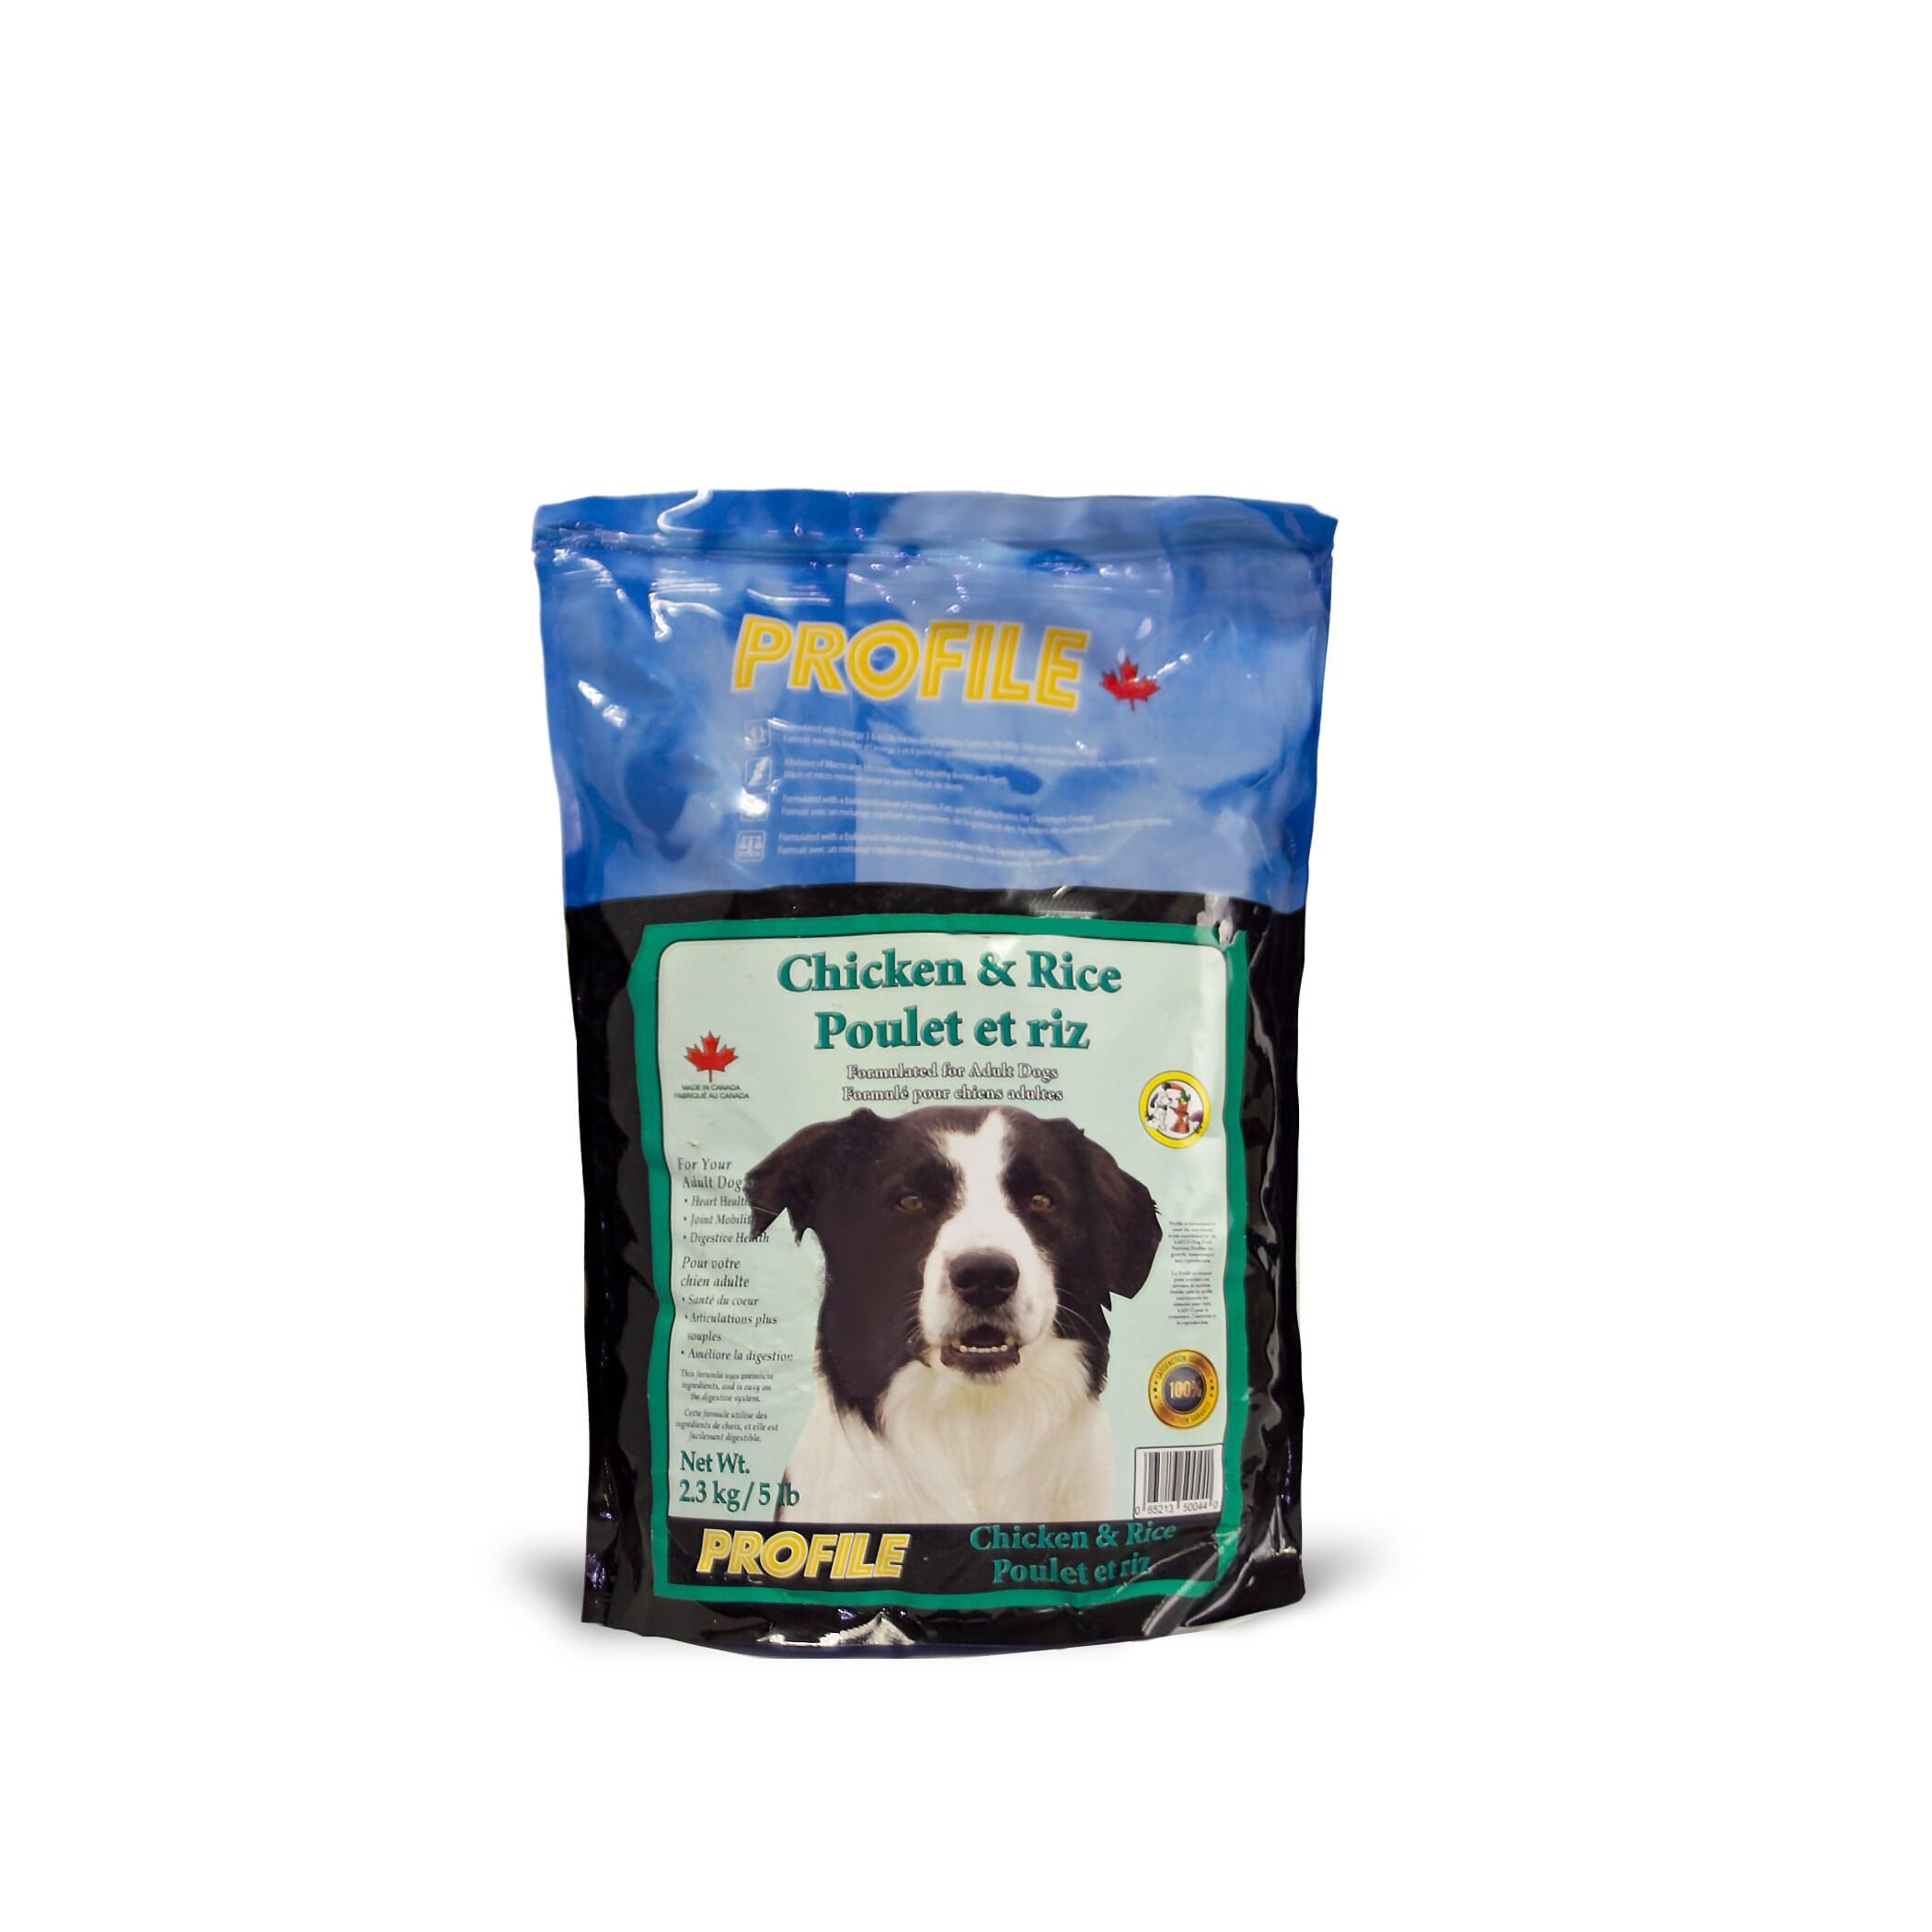 Profile Chicken & Rice Dry Dog Food Image